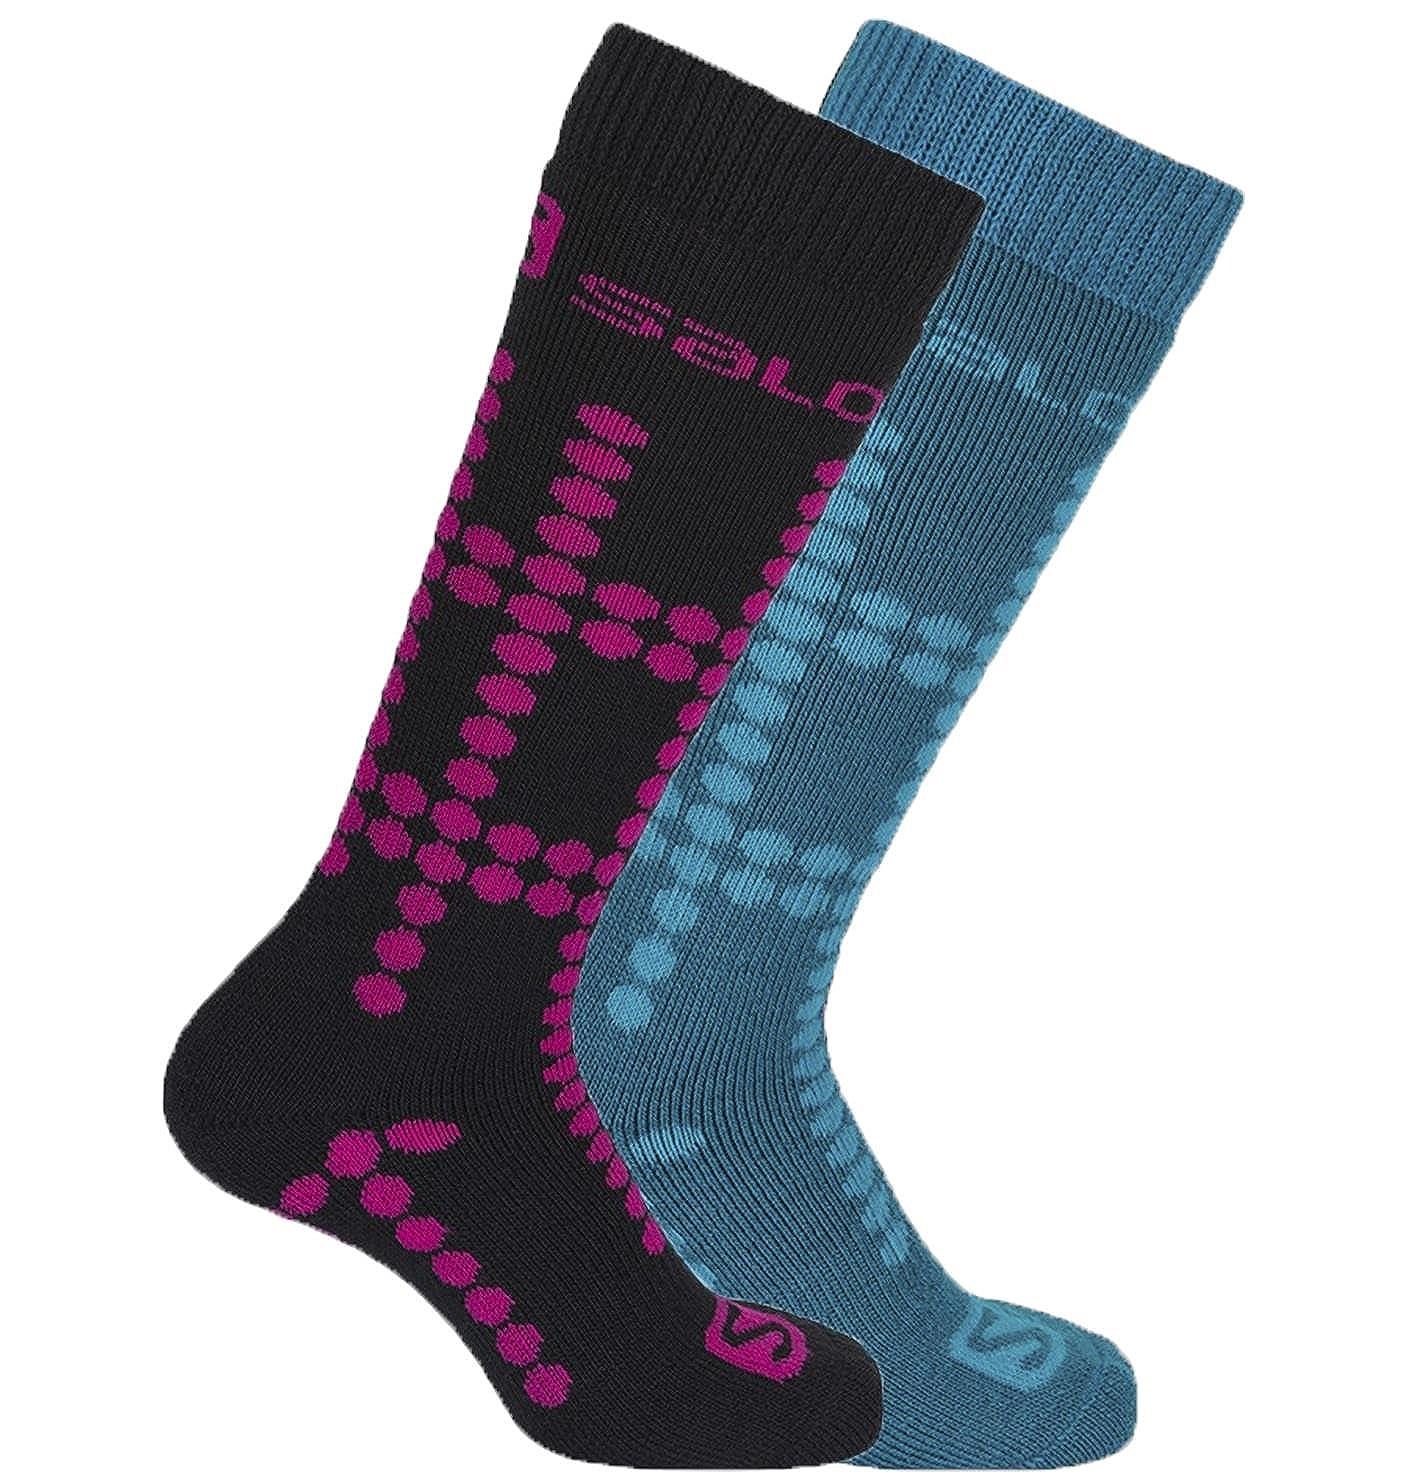 Salomon Team Kids Ski Socks, Twin Pack - Black/Kouak Blue